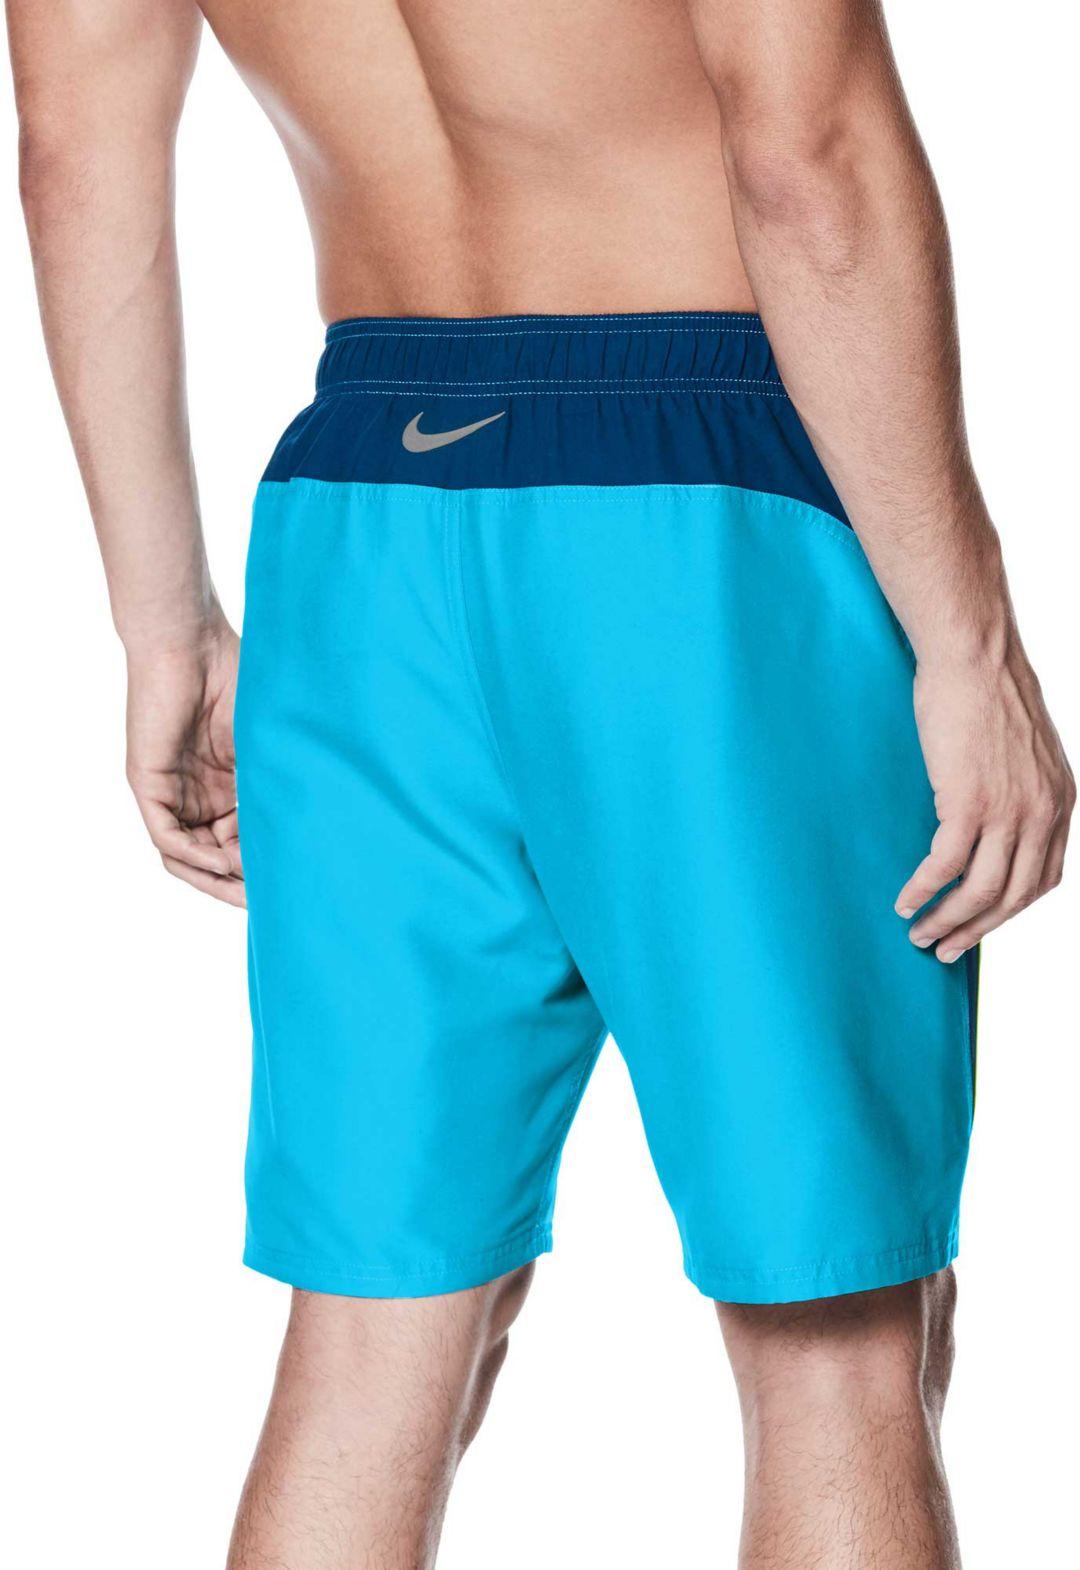 ff75e51699 Nike Men's Core Contend Board Shorts | DICK'S Sporting Goods